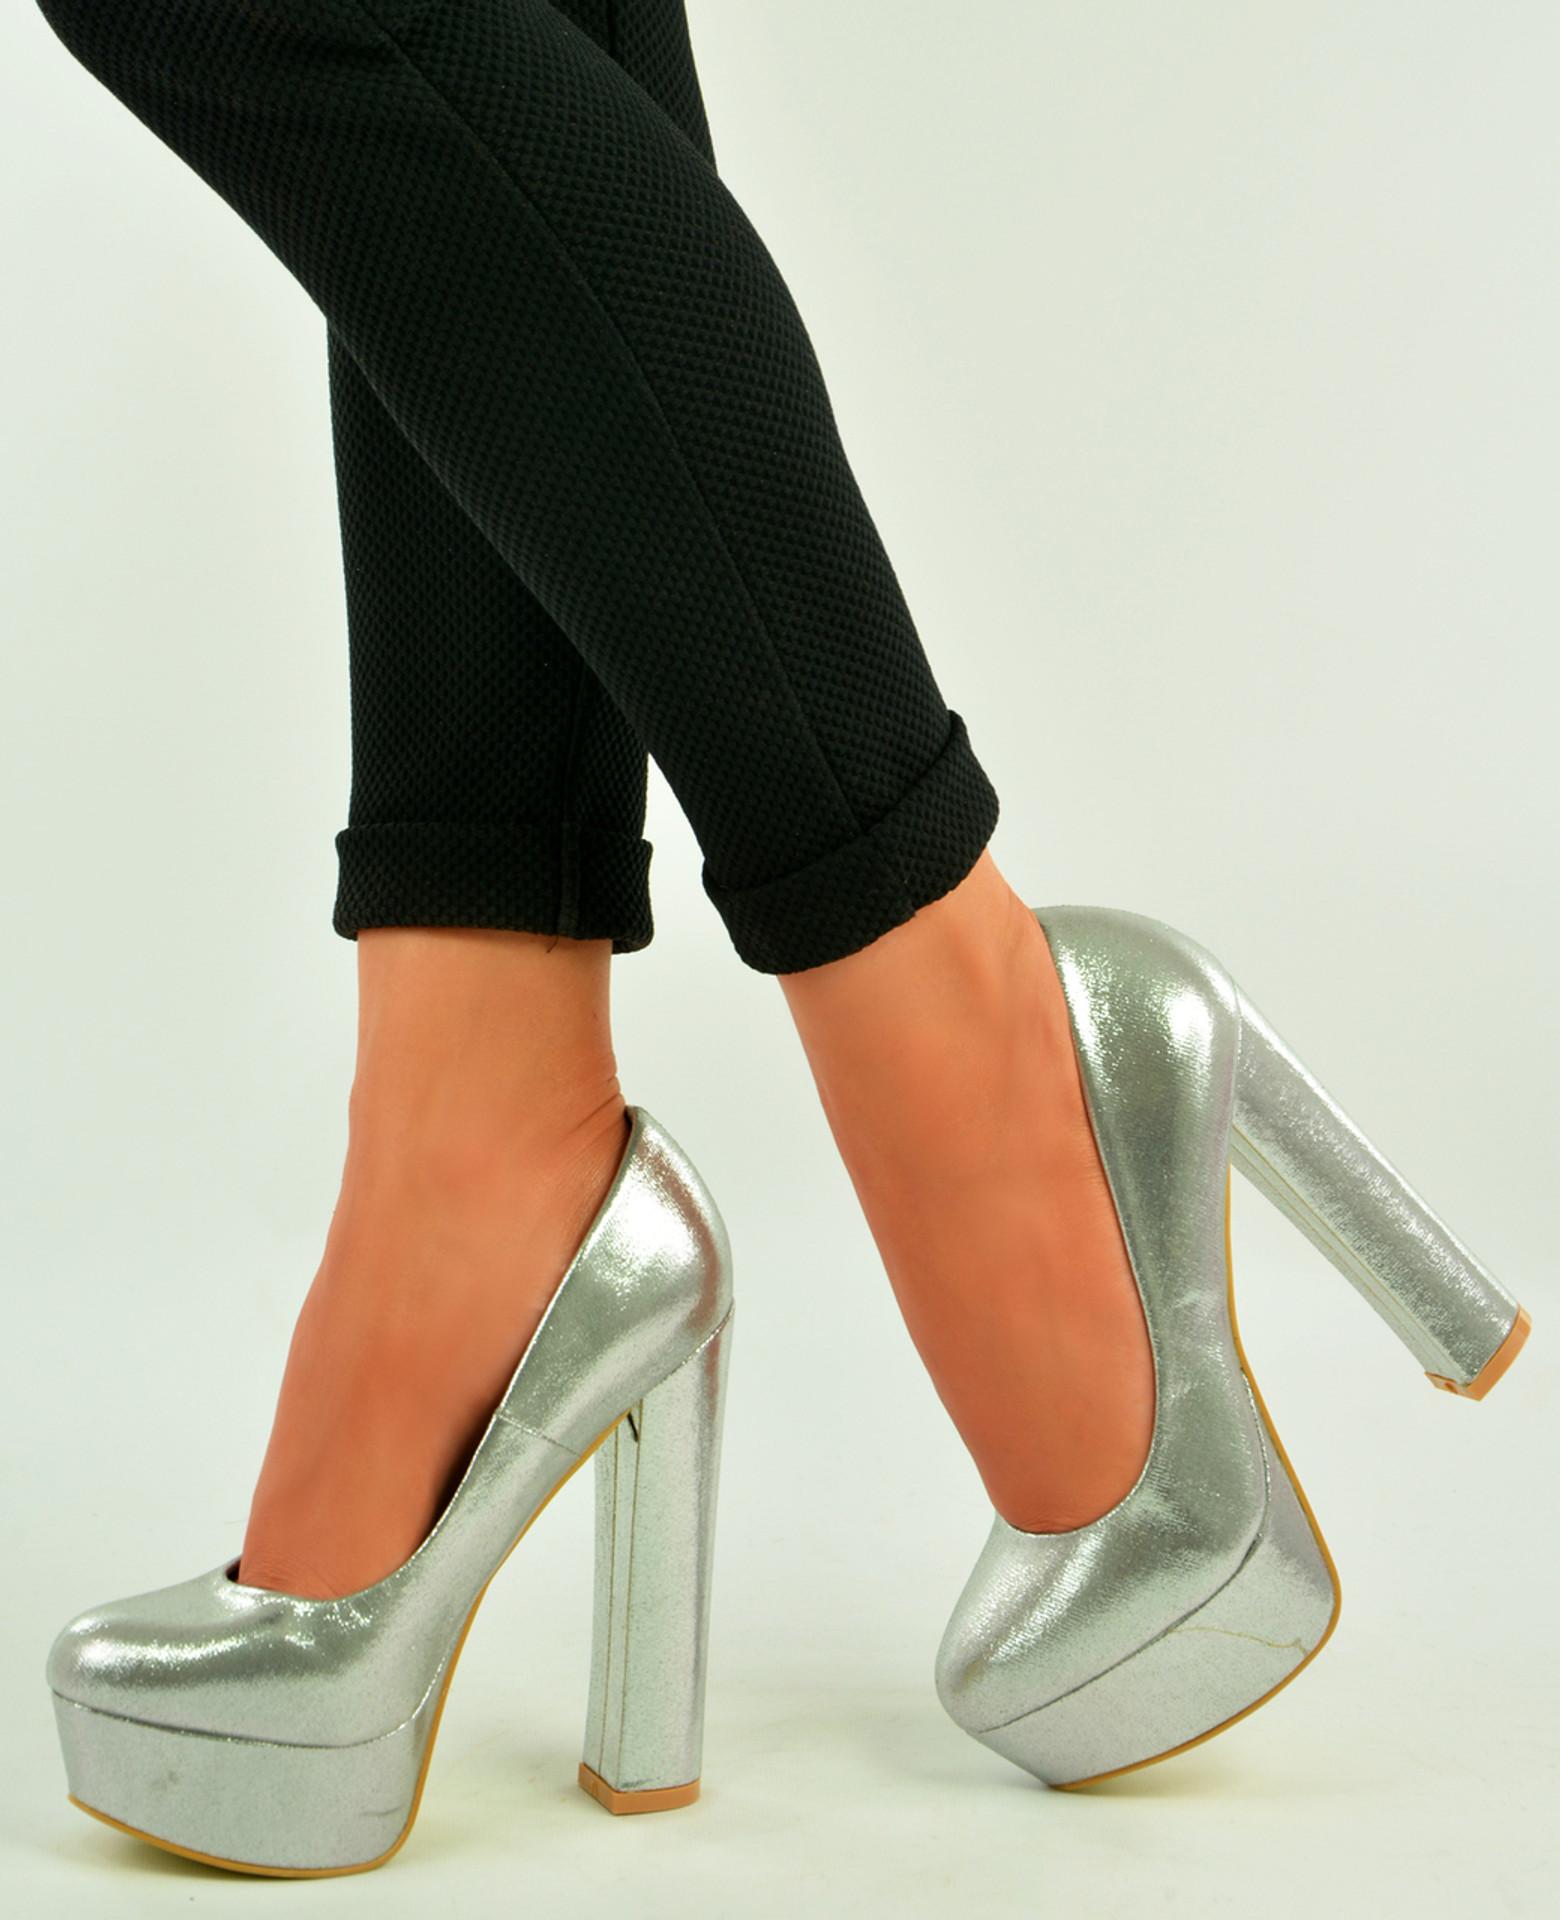 Silver High Block Heel Platform Sandals Pumps